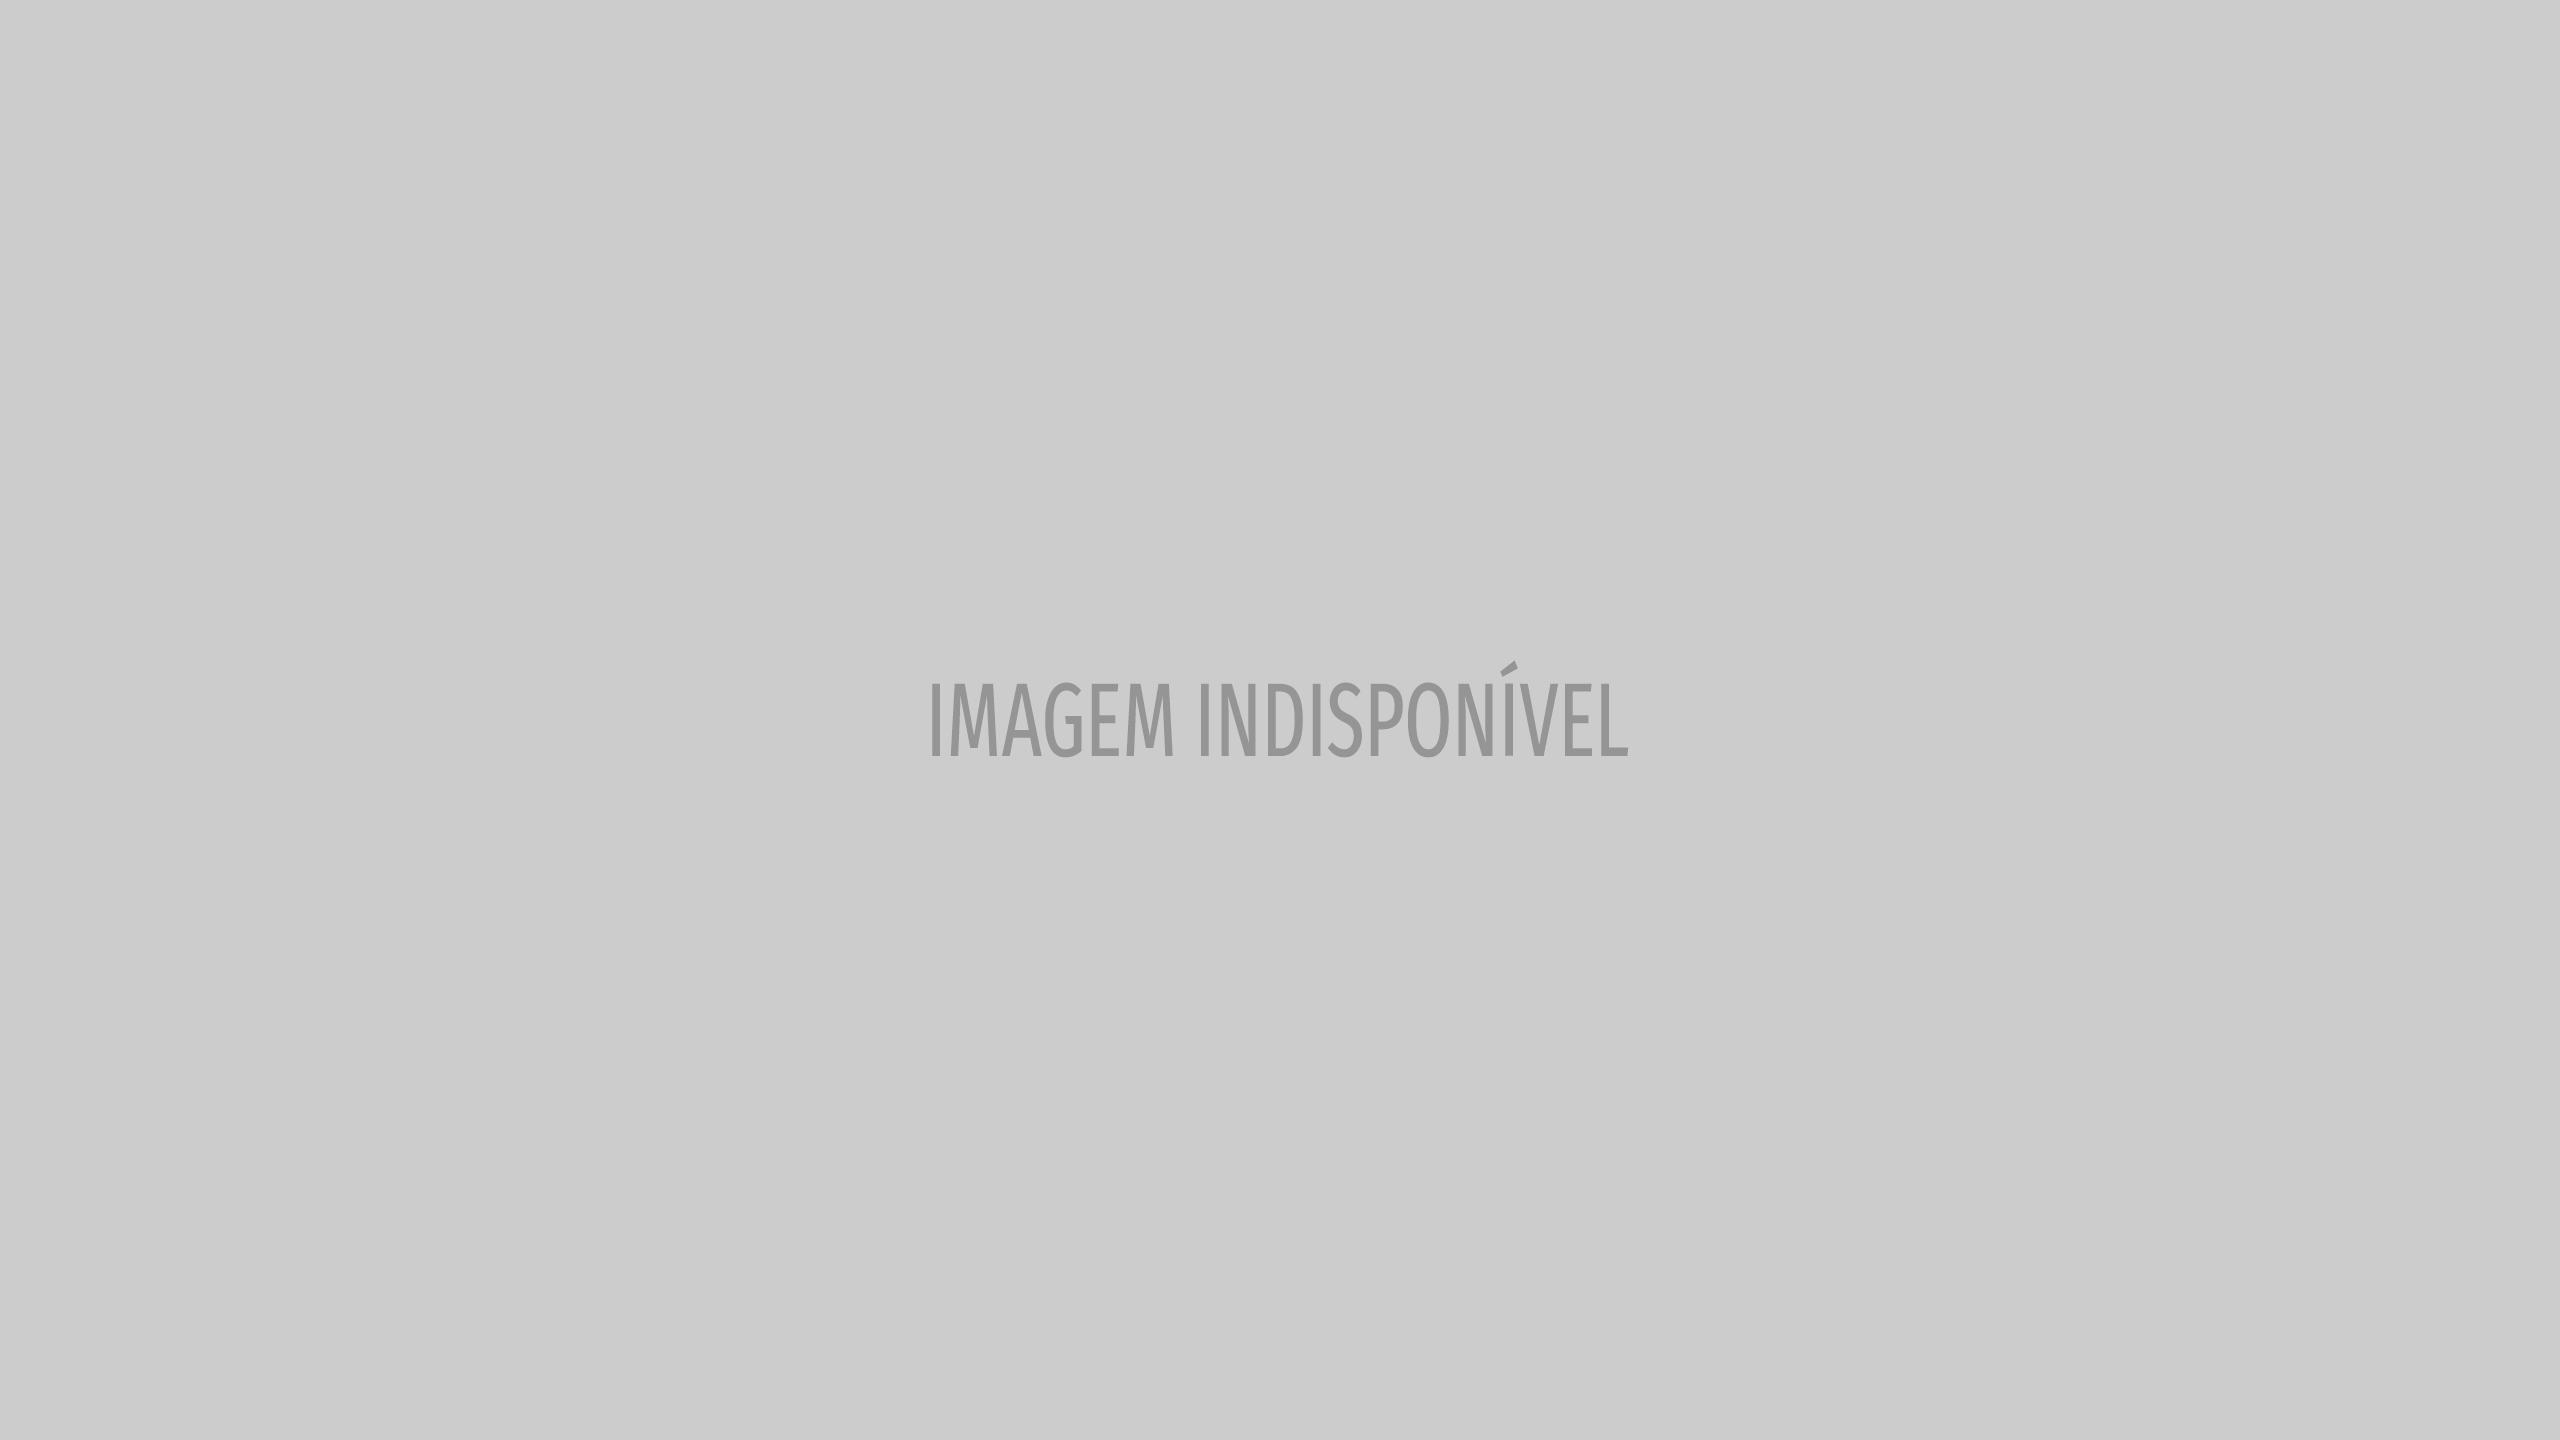 Vestido transparente e fio dental: Kourtney Kardashian sensual ao máximo